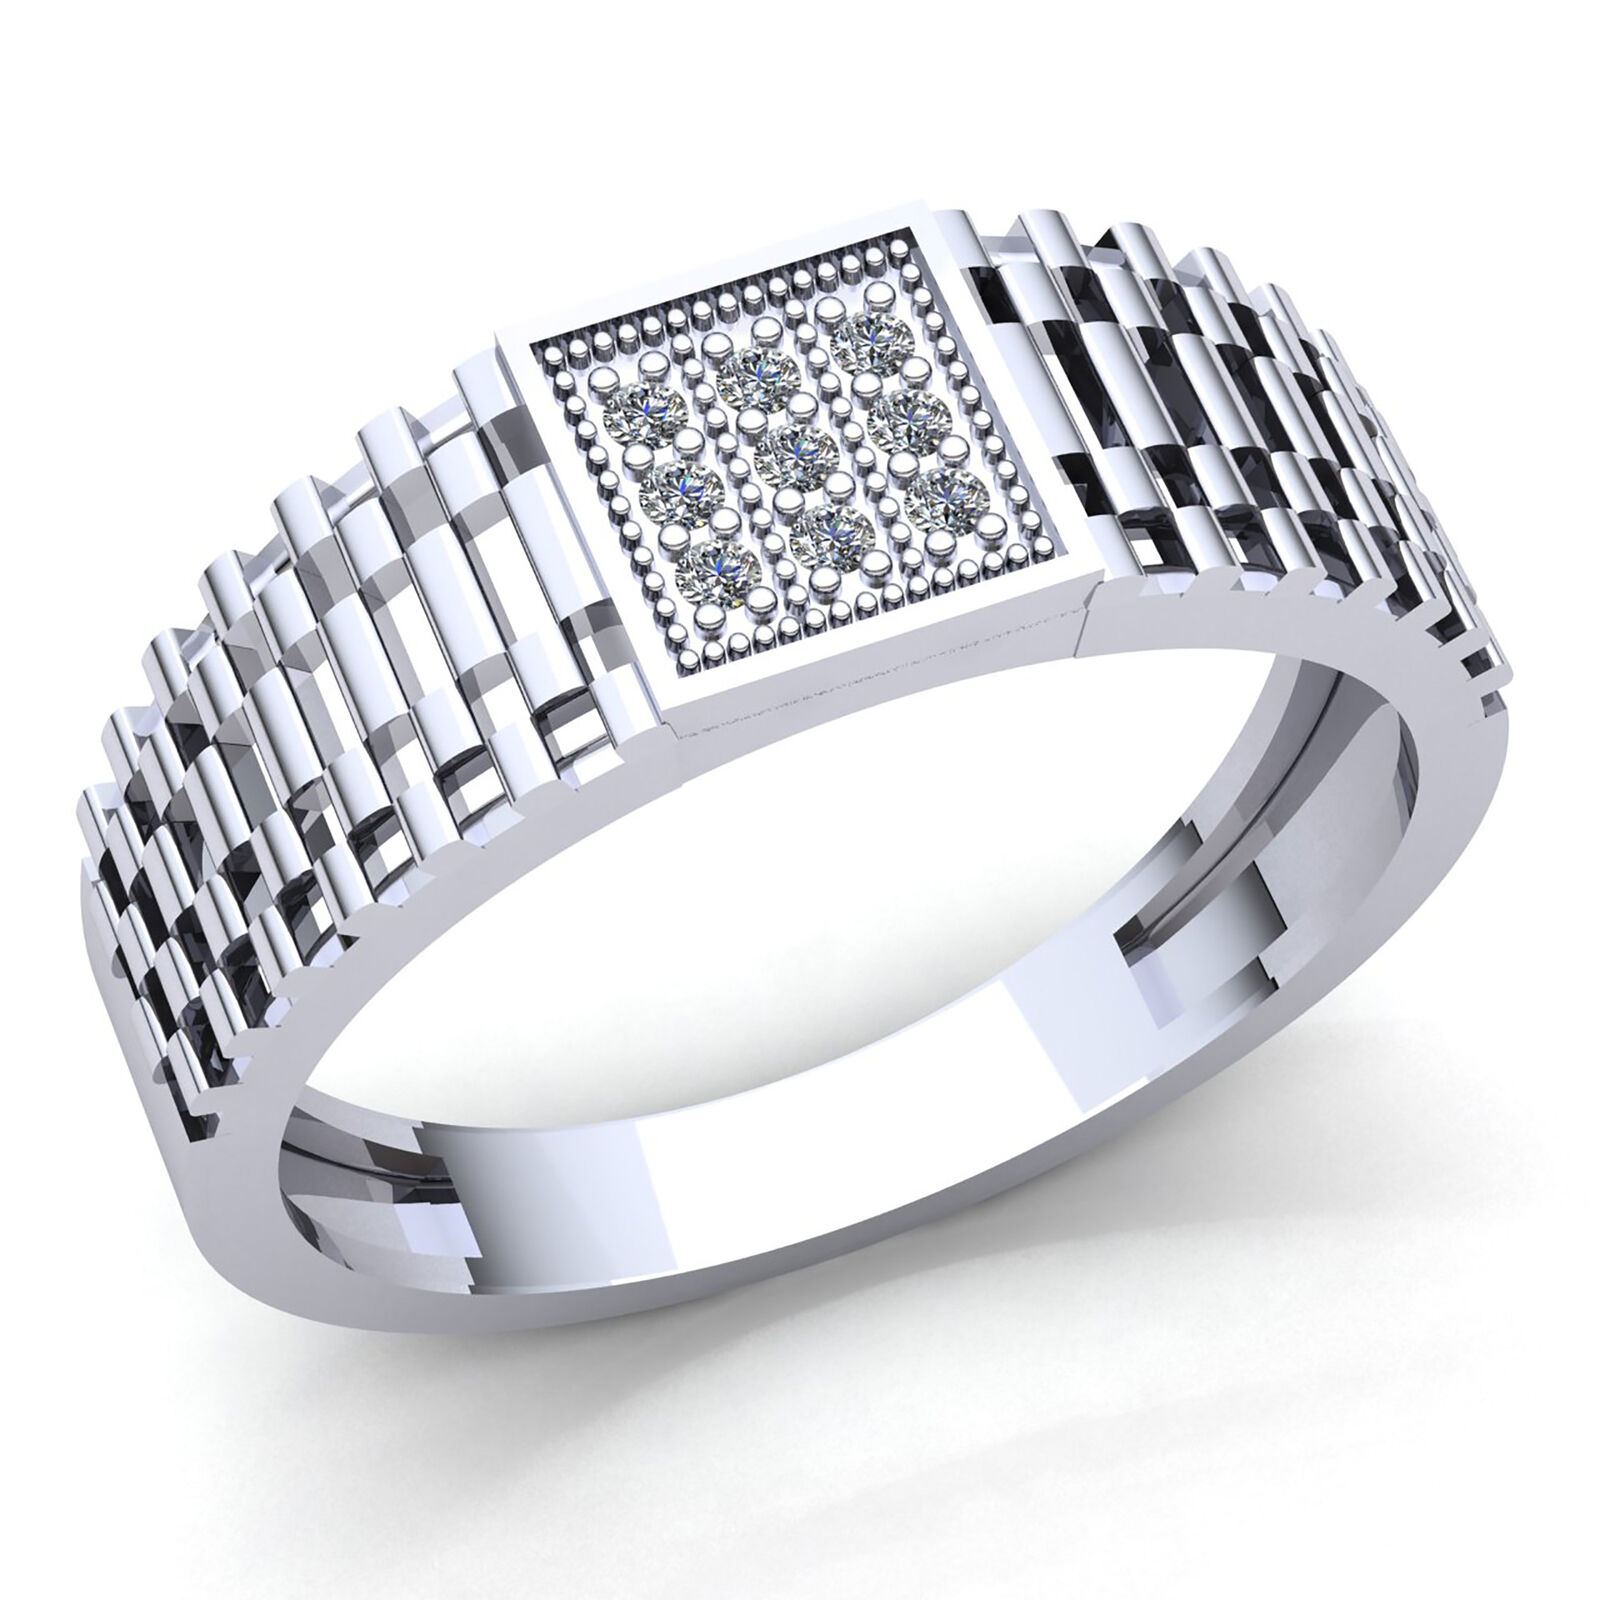 0.1carat Genuine Round Diamond Mens Pinky Engagement Ring 14K gold